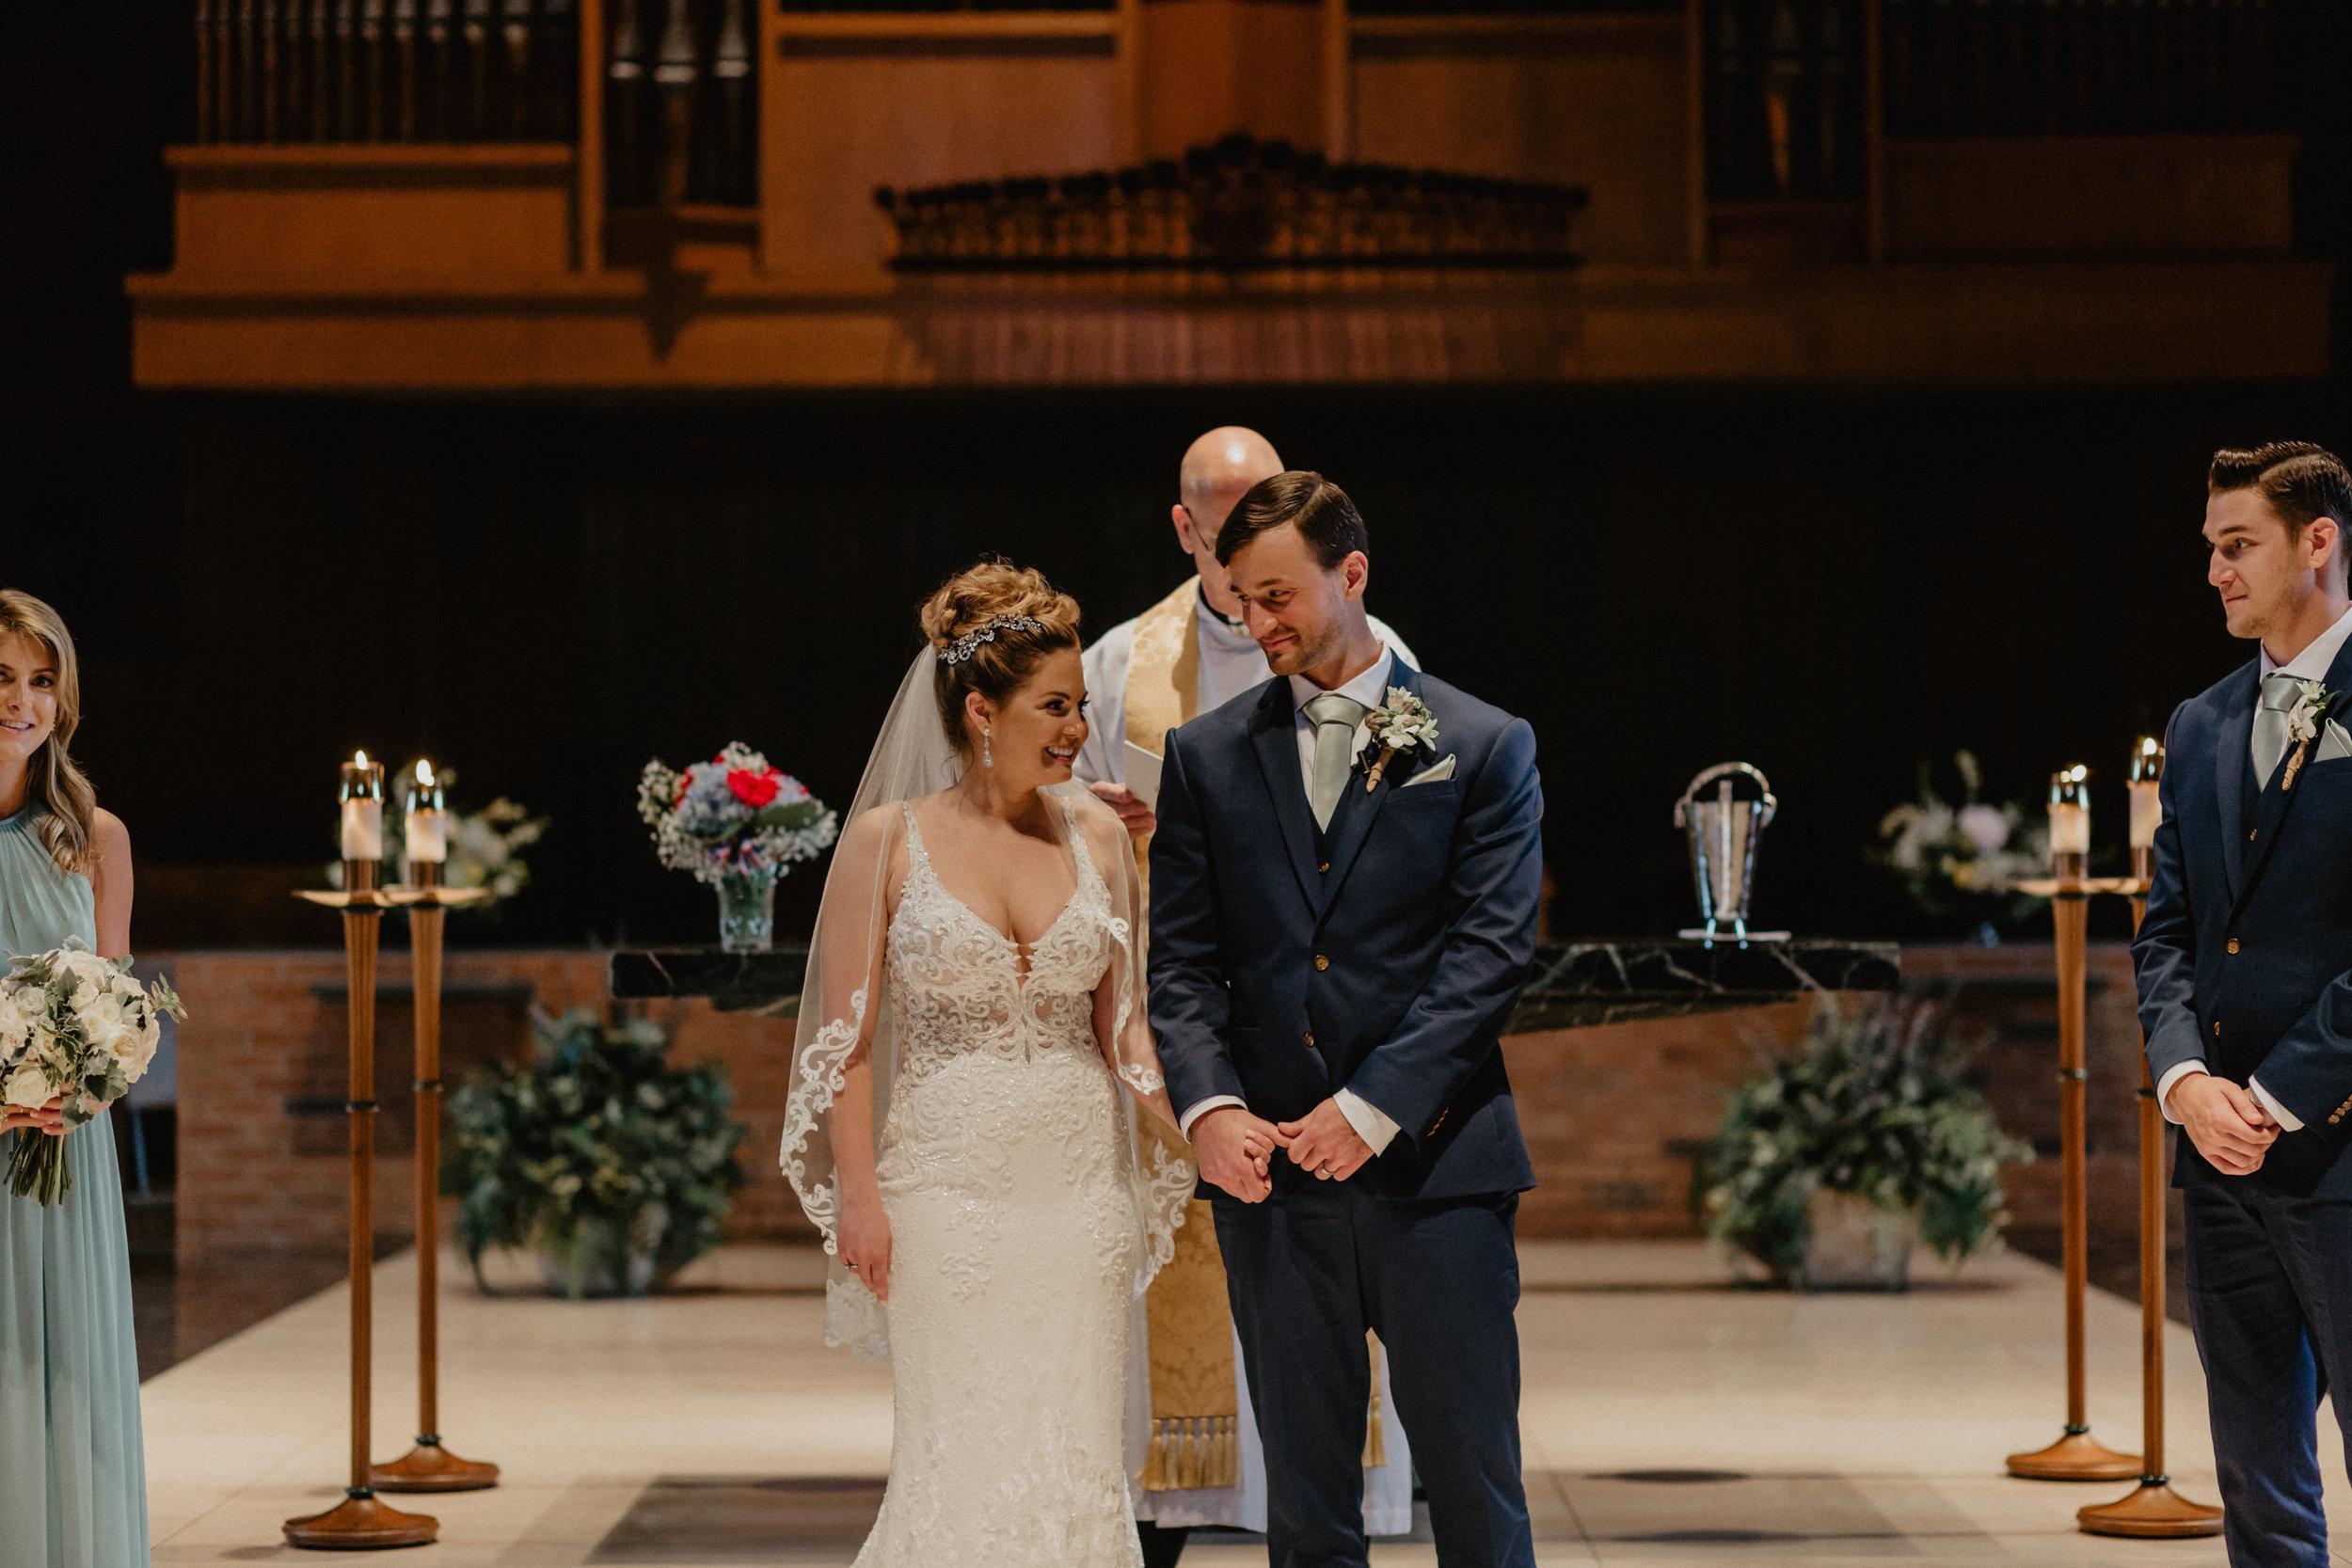 old_daley_on_crooked_lake_wedding_-49.jpg